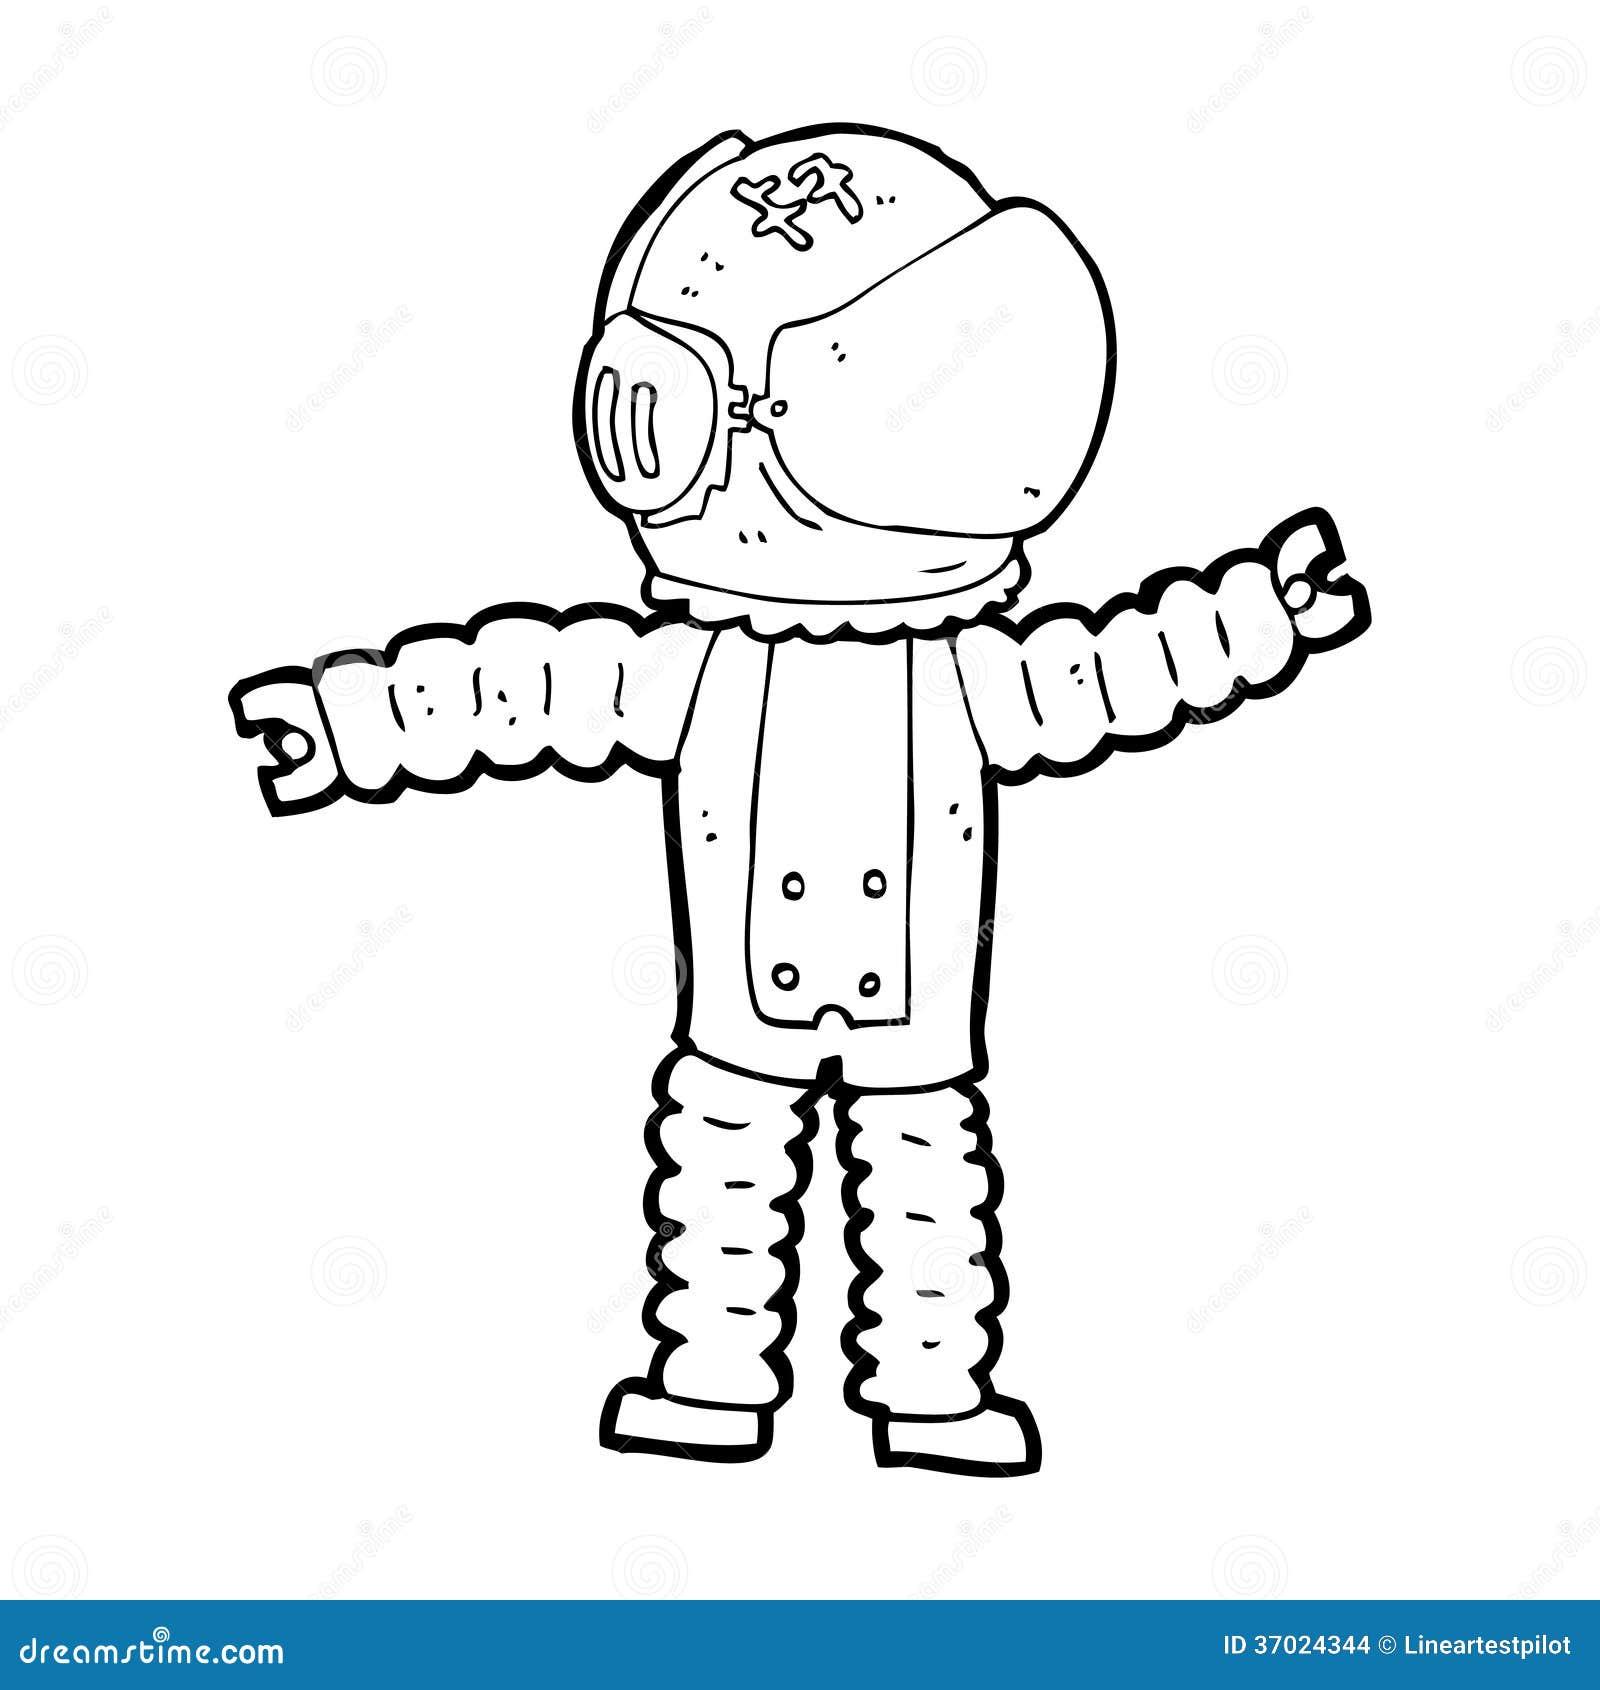 Cartoon Astronaut Reaching Stock Images - Image: 37024344